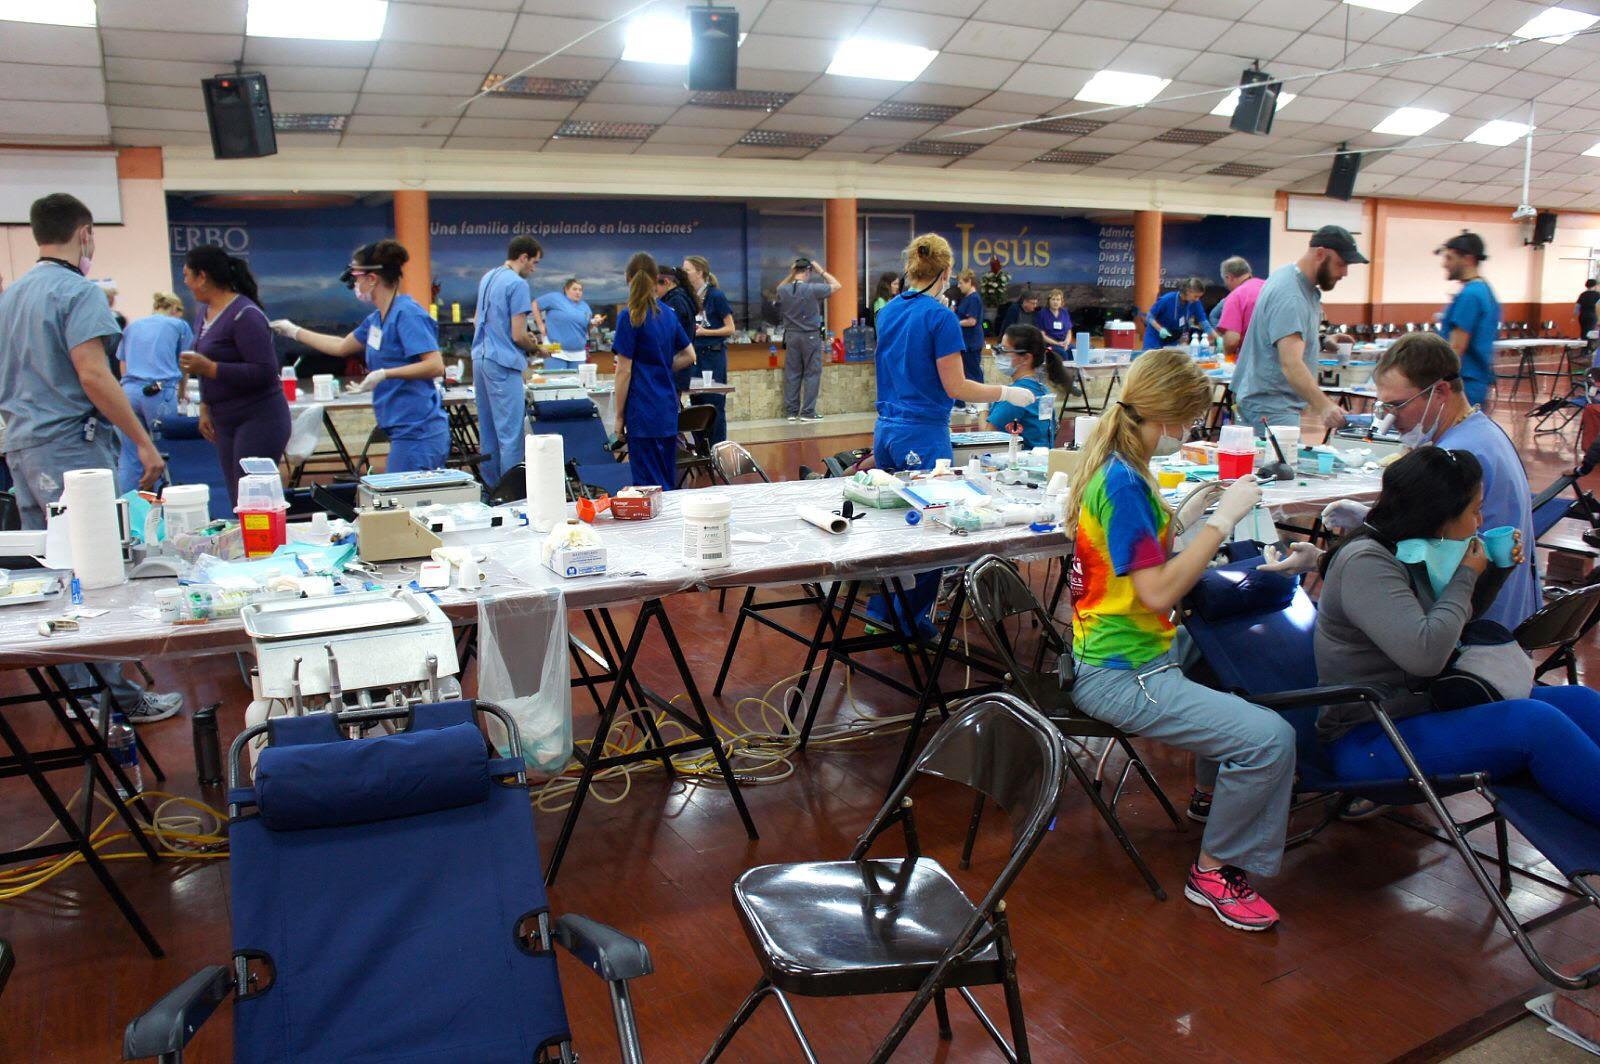 Volunteering at a Dental Clinic overseas